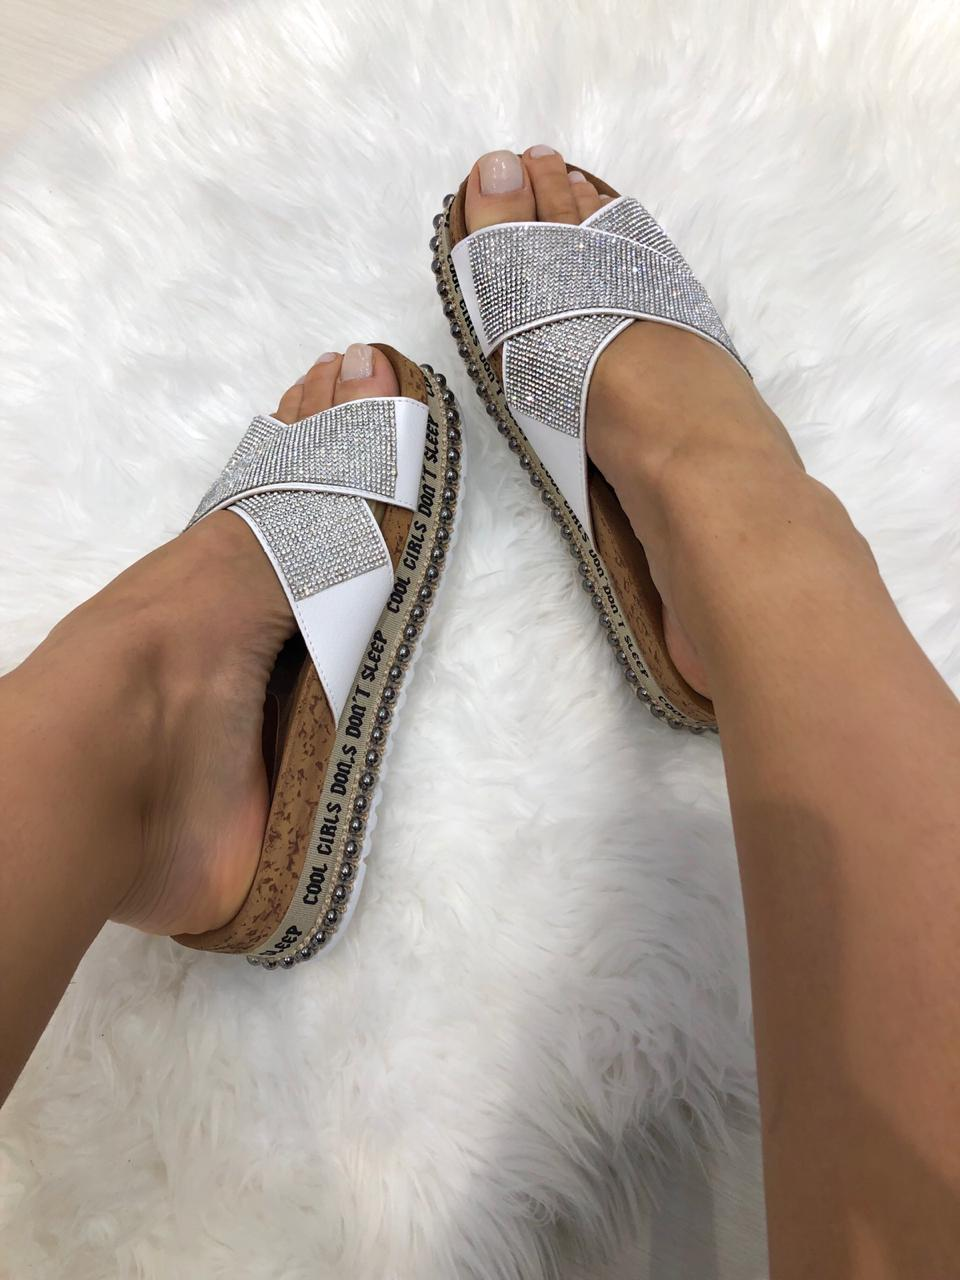 4a695c9914 Tamanco ShineSandáliasAmandine Shoes